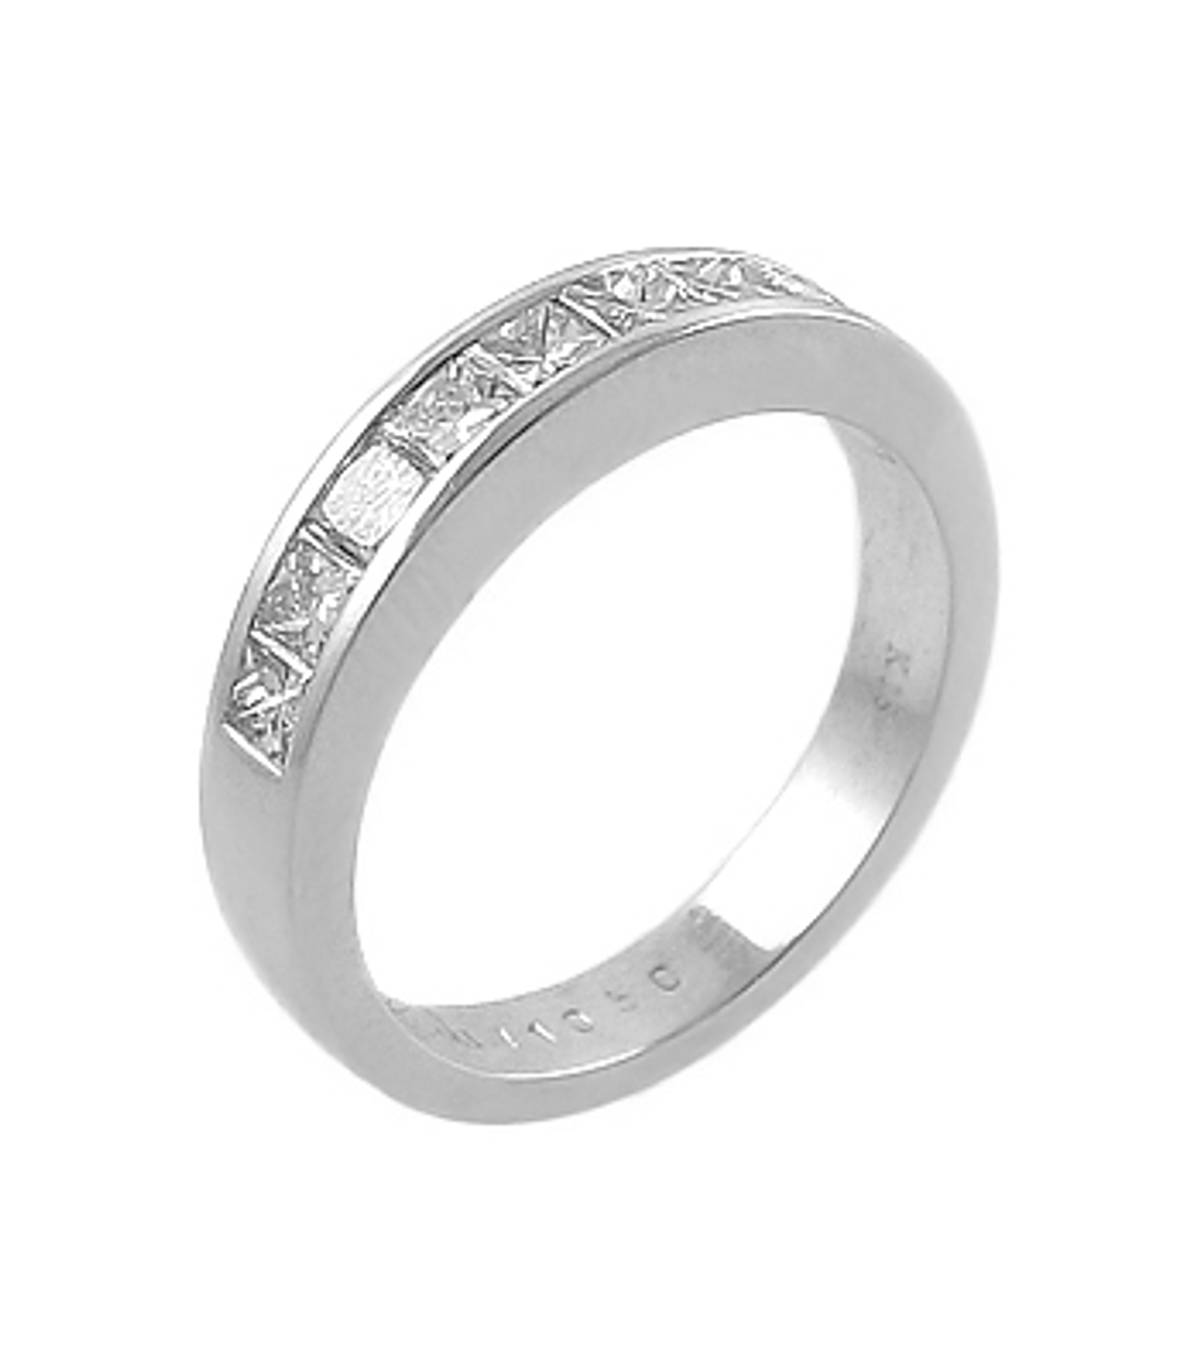 Platinum princess cut 8st diamond channel set ring Carat: Total Diamond Weight 1.25cts Metal: Platinum